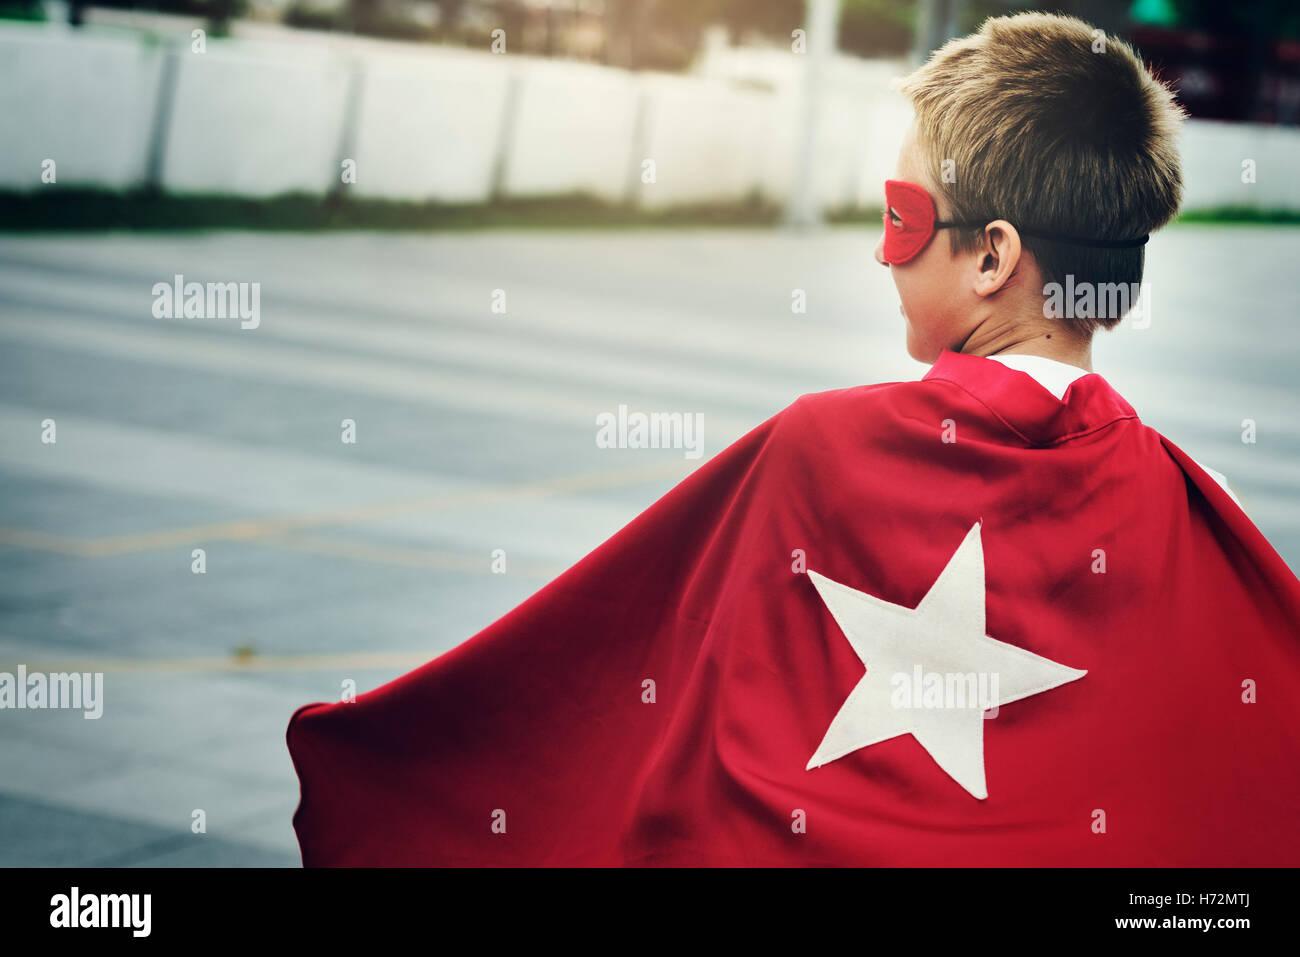 Superhero Boy Imagination Freedom Happiness Concept - Stock Image